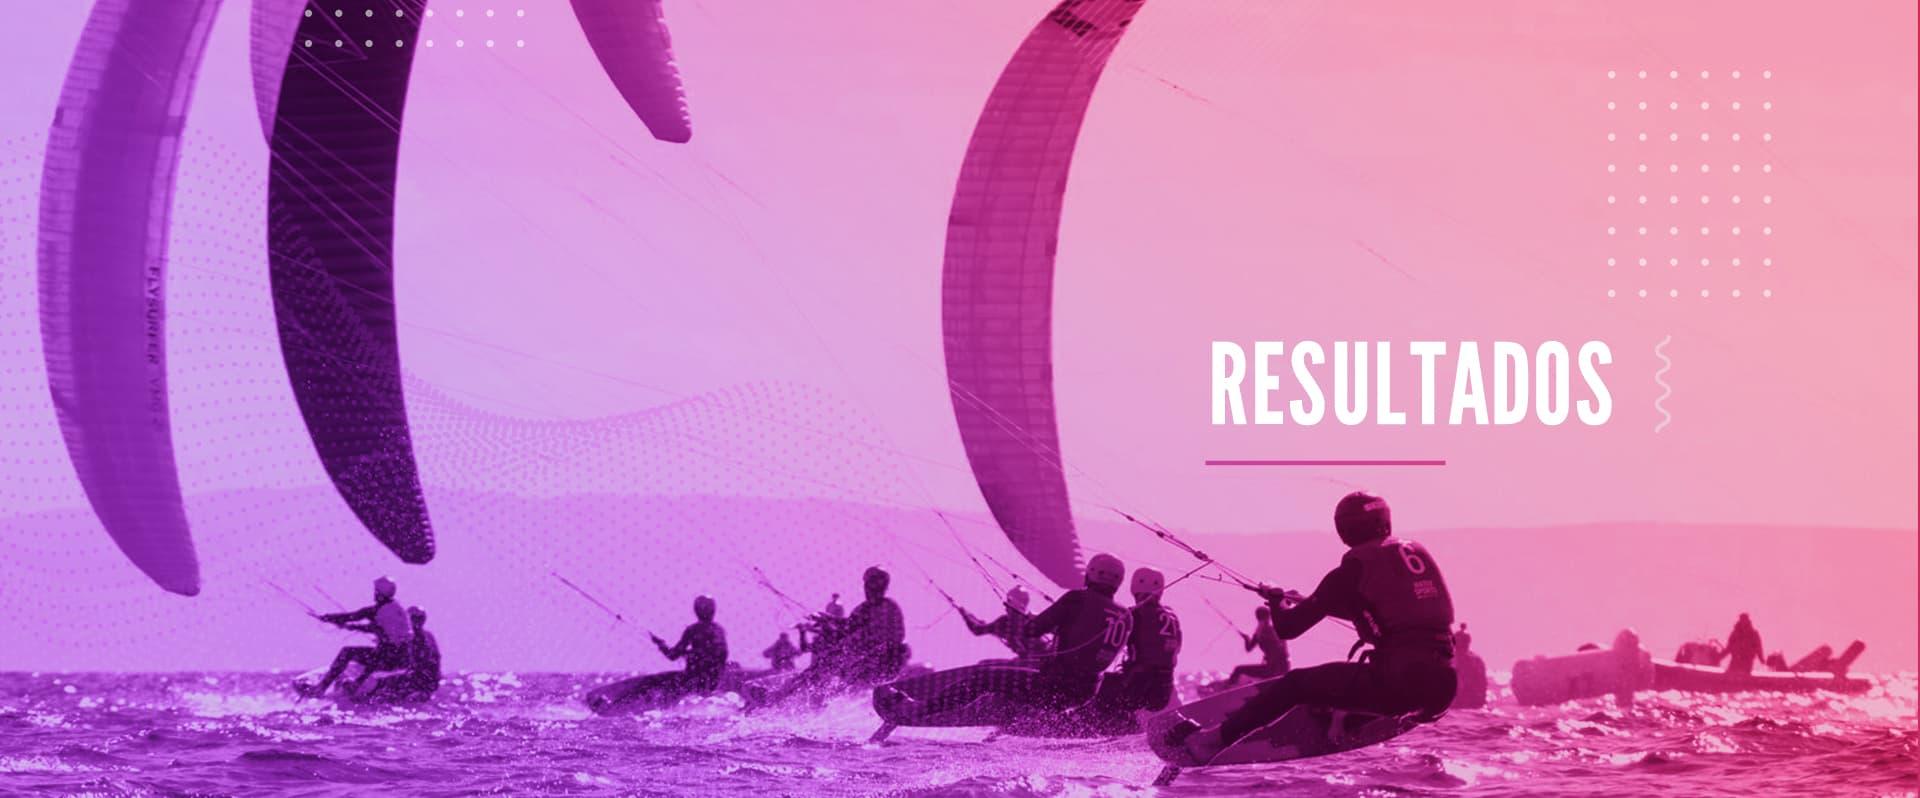 Banner FKSS 2020 - Resultados